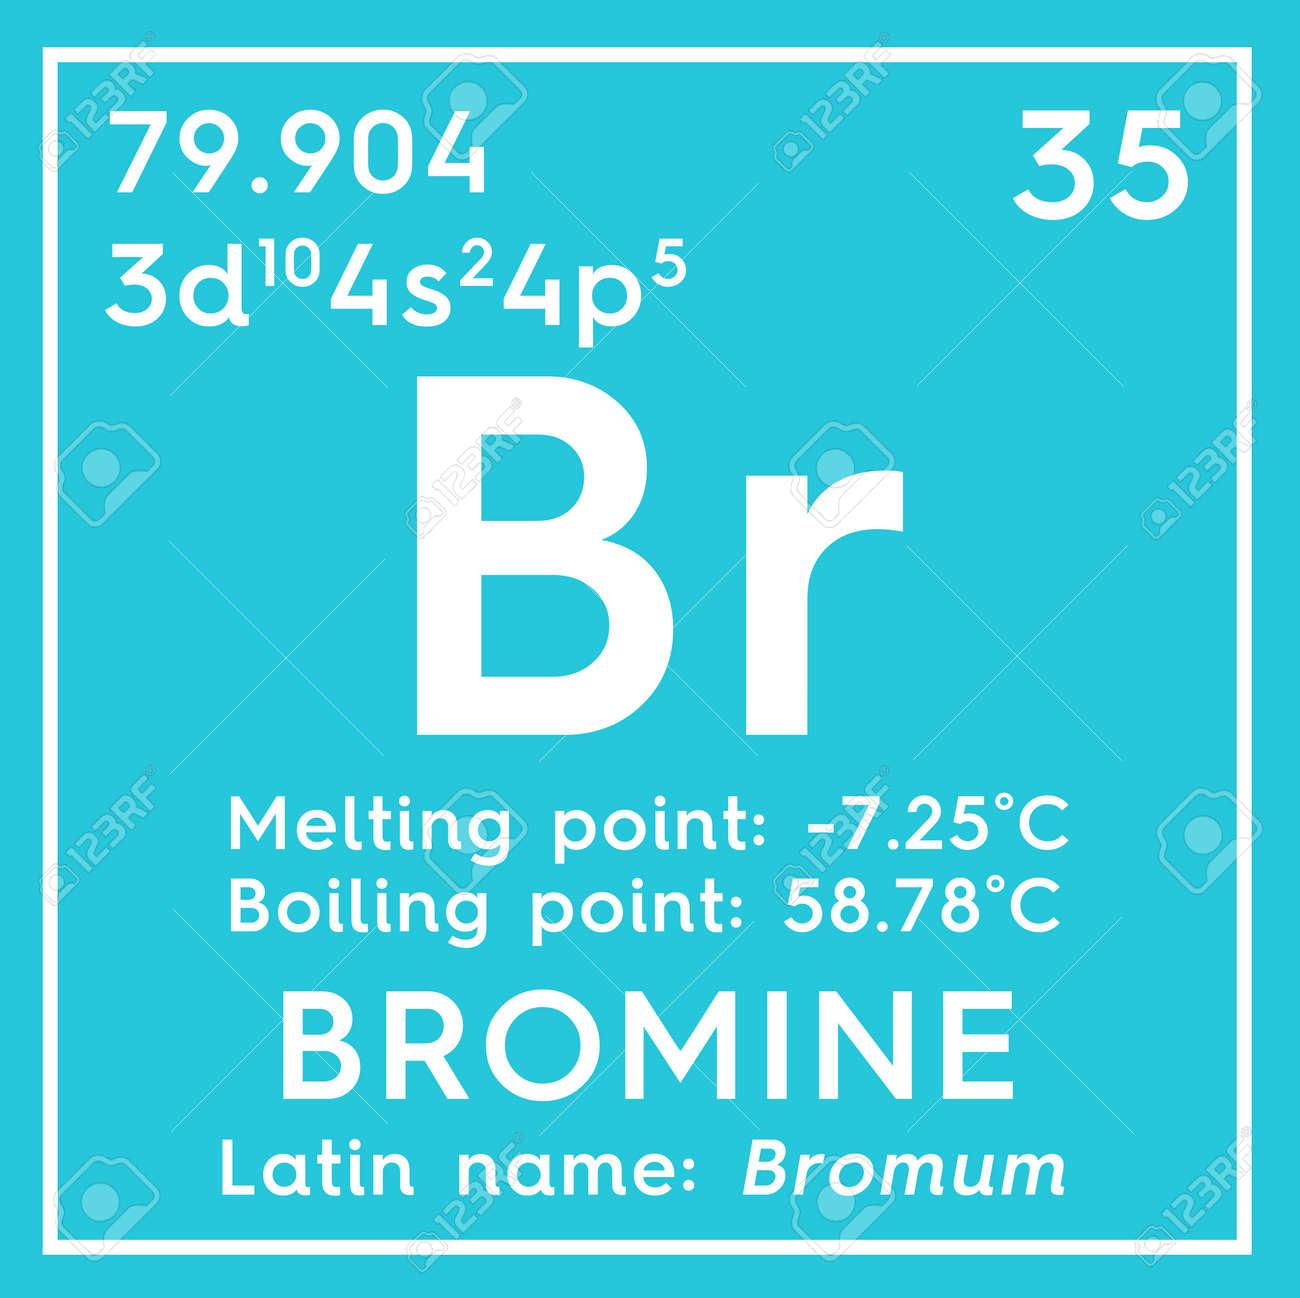 Bromine Bromum Halogens Chemical Element Of Mendeleevs Periodic